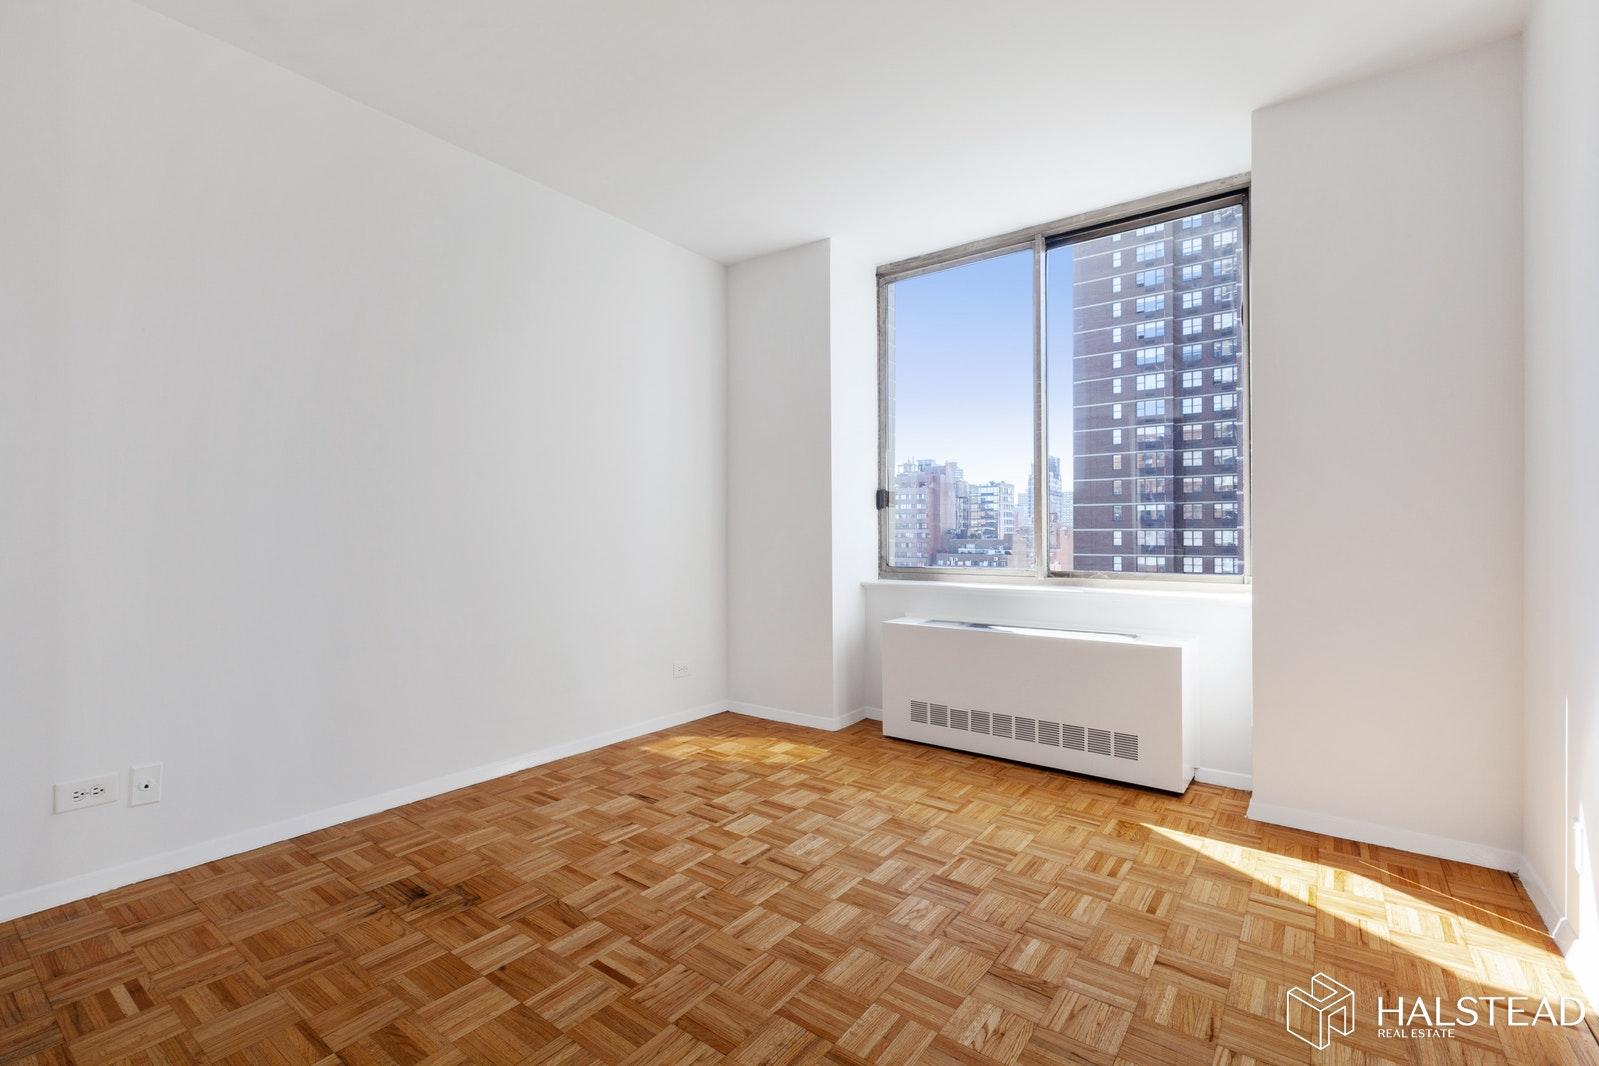 200 EAST 89TH STREET 15A, Upper East Side, $725,000, Web #: 19894906